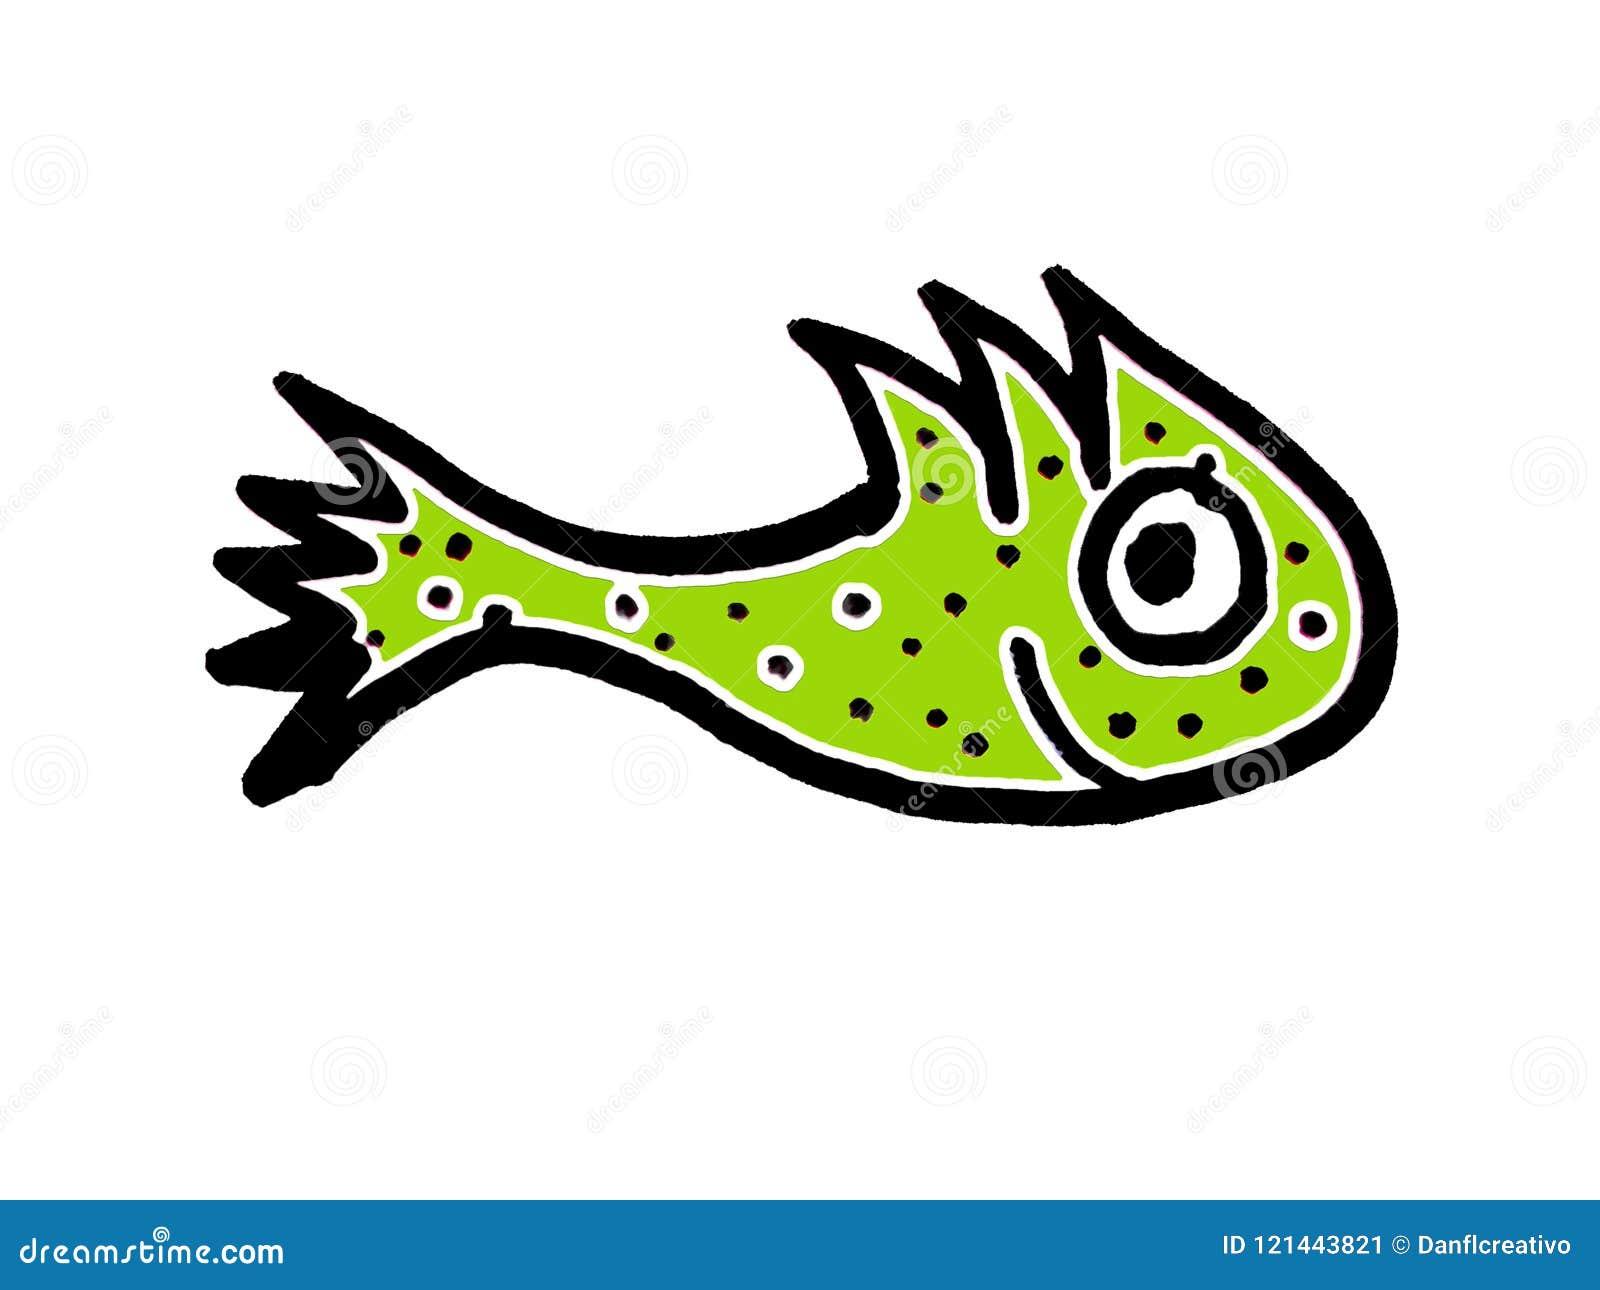 Cute Fish Cartoon Kids Style Drawing Stock Illustration